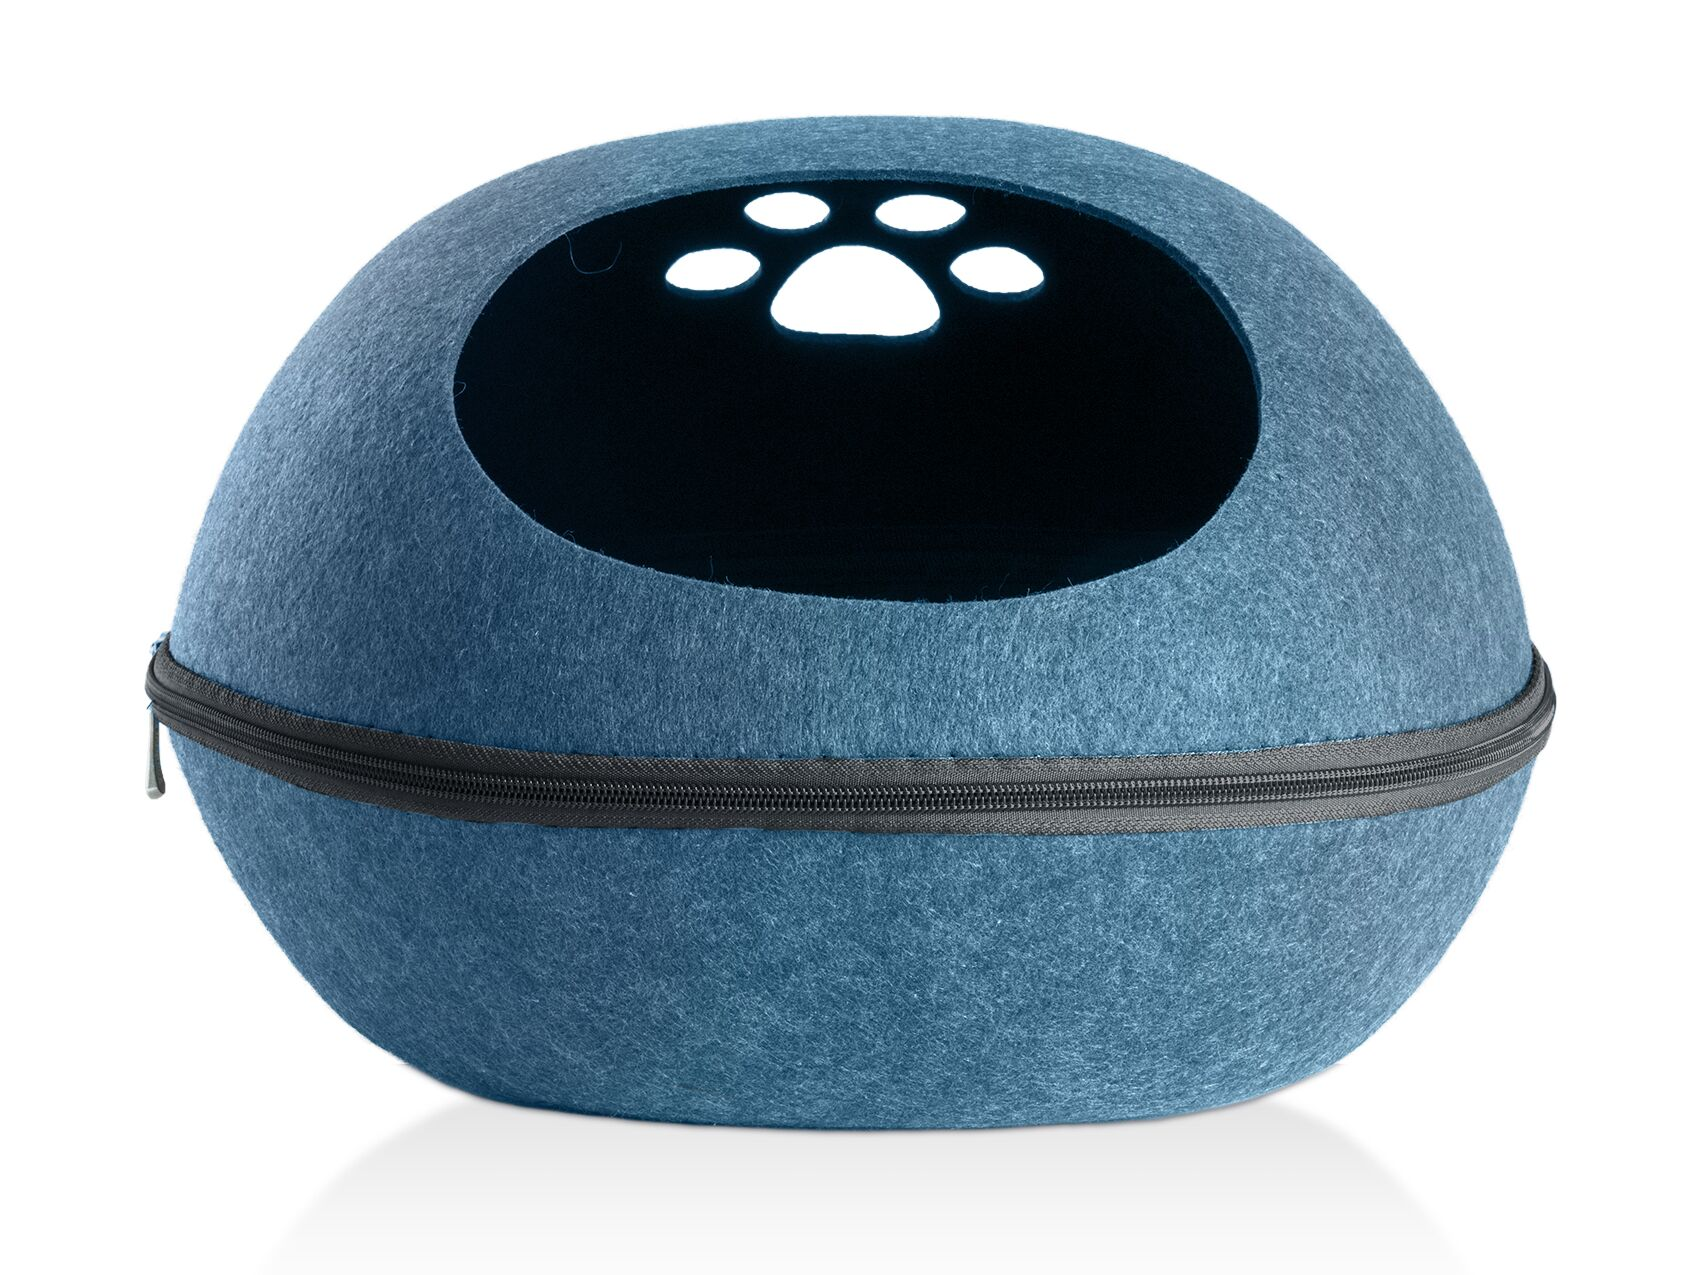 Gira Paw Oval Felt Dome Color: Blue